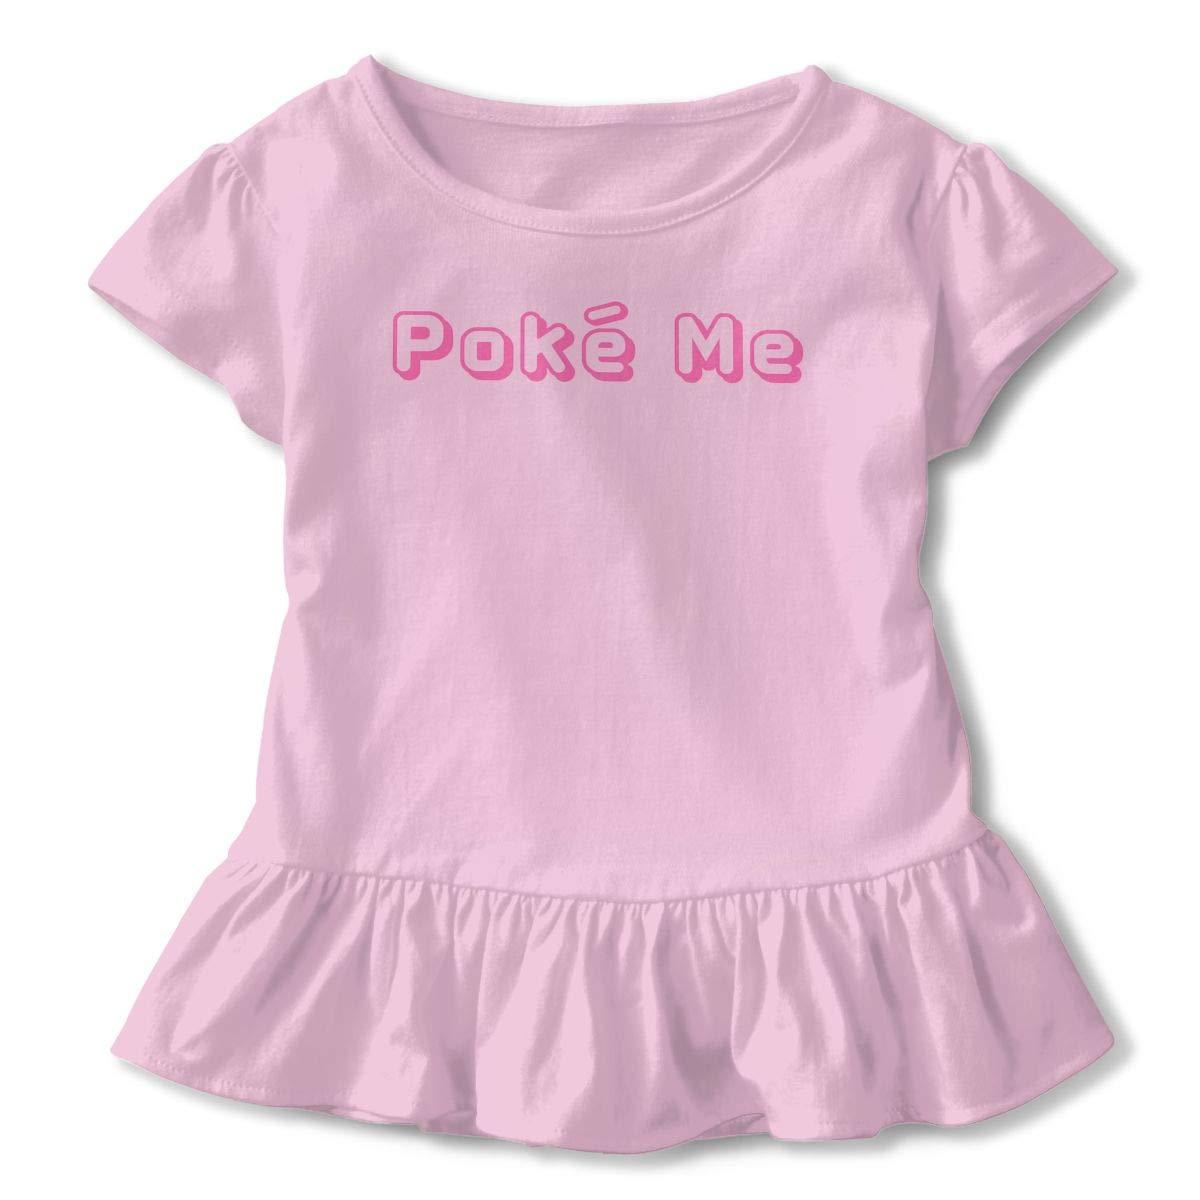 JVNSS Pok/é Me Shirt Comfort Infant Girl Flounced T Shirts Graphic T-Shirt for 2-6T Baby Girls